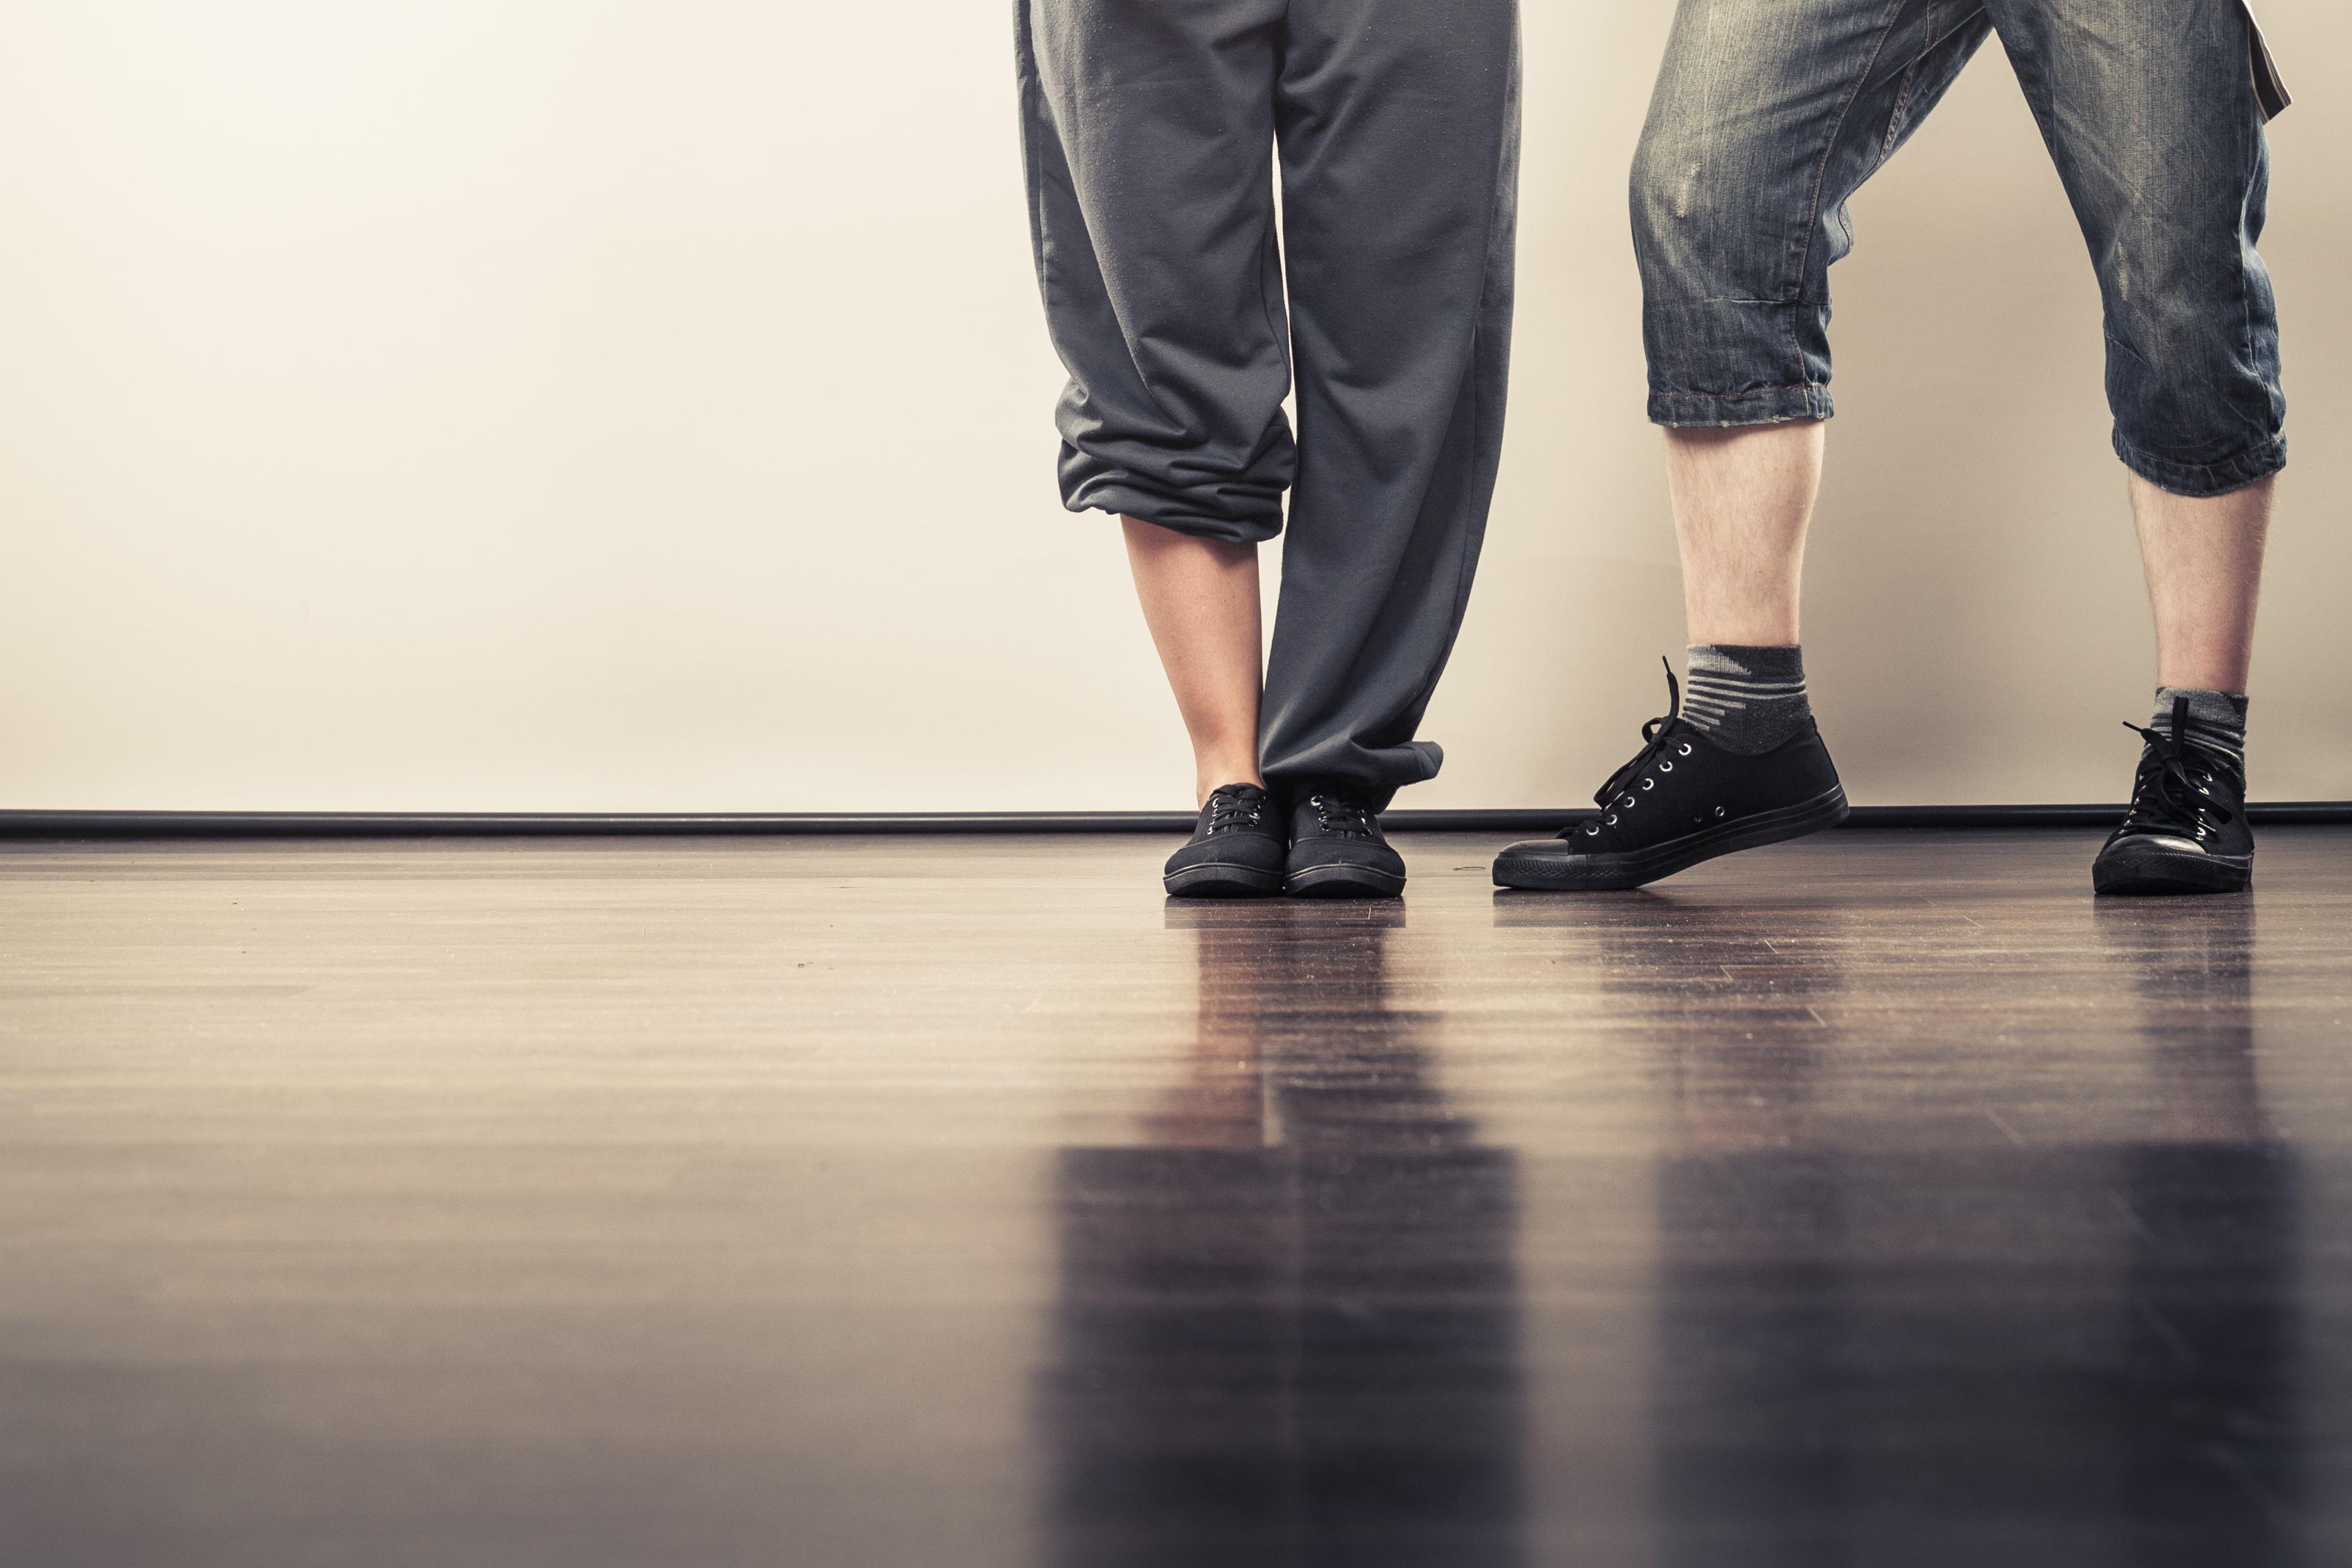 dancing feet